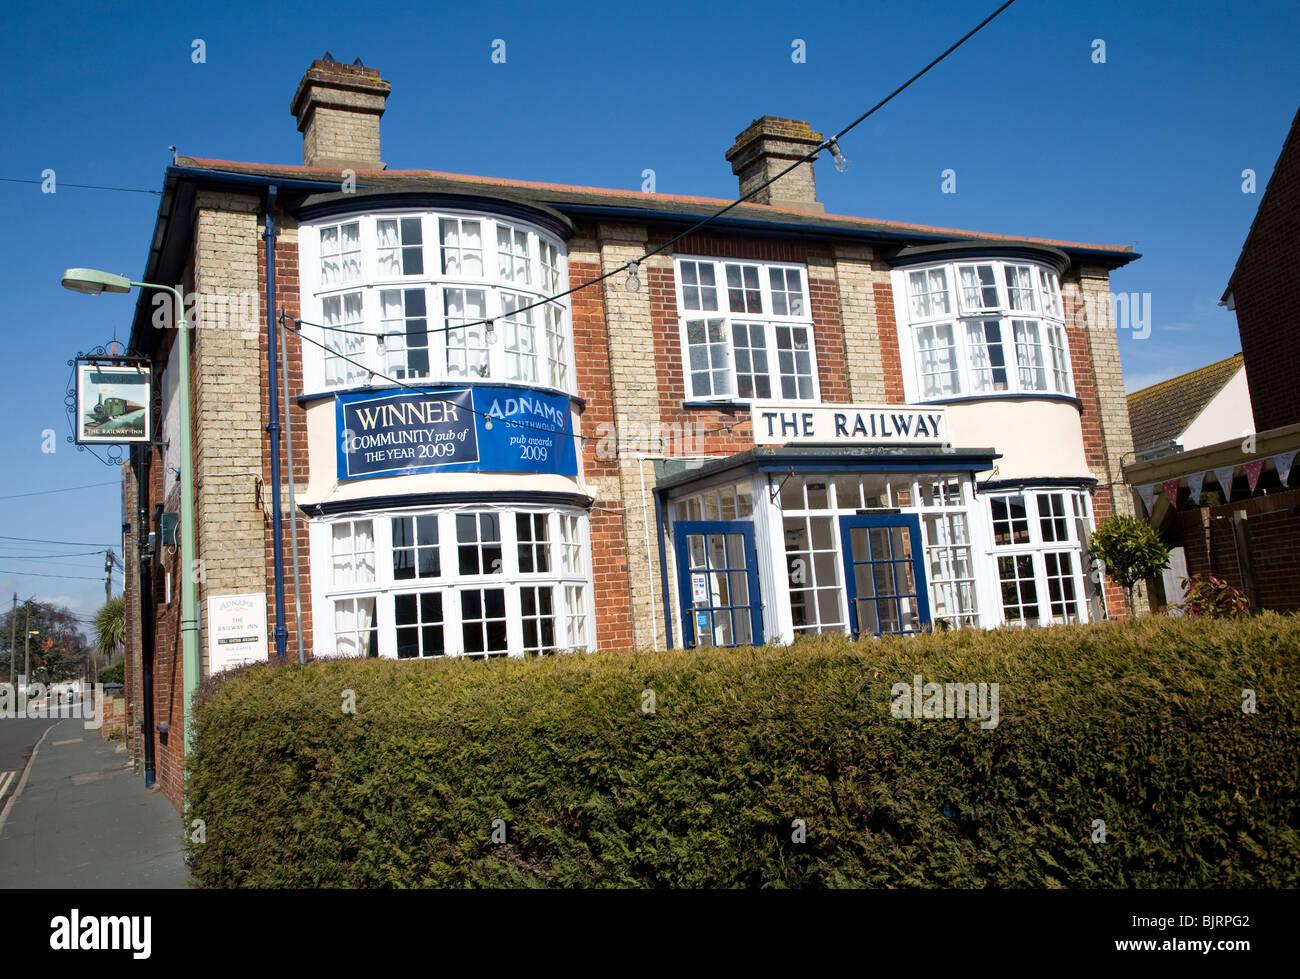 The Railway award winning Adnams pub, Aldeburgh, Suffolk - Stock Image